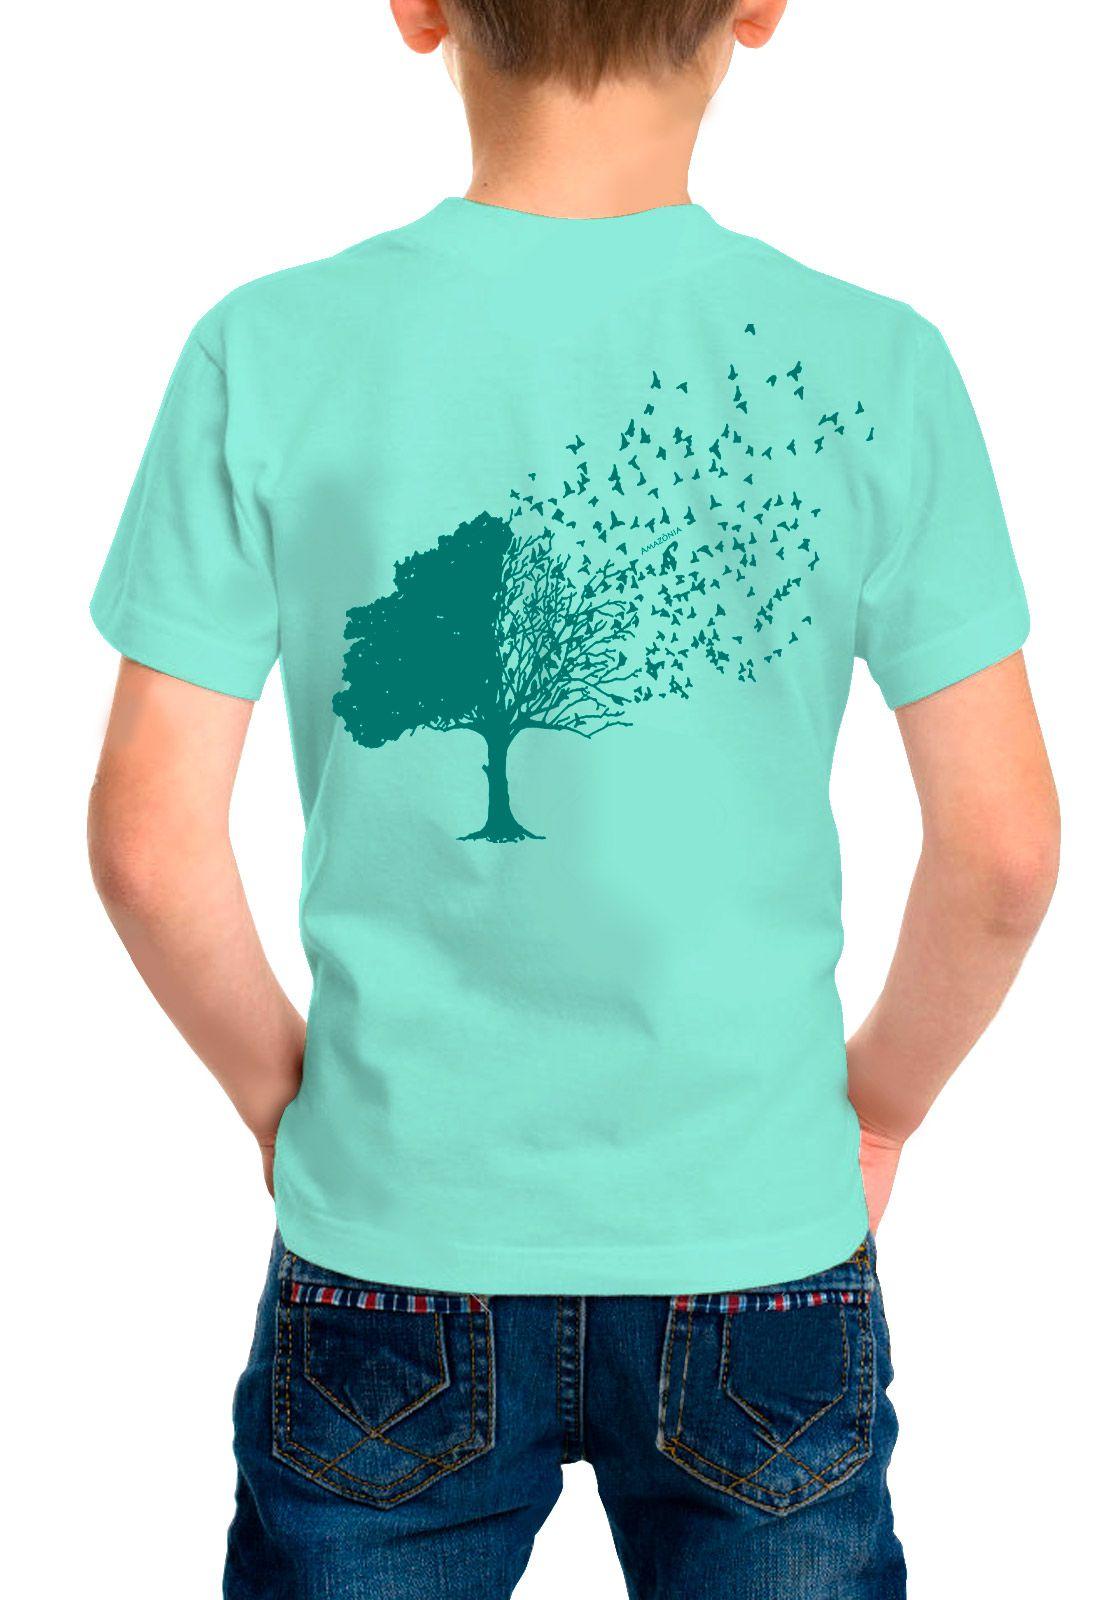 Camiseta Amazônia Infantil Árvore Pássaros - Verde Claro